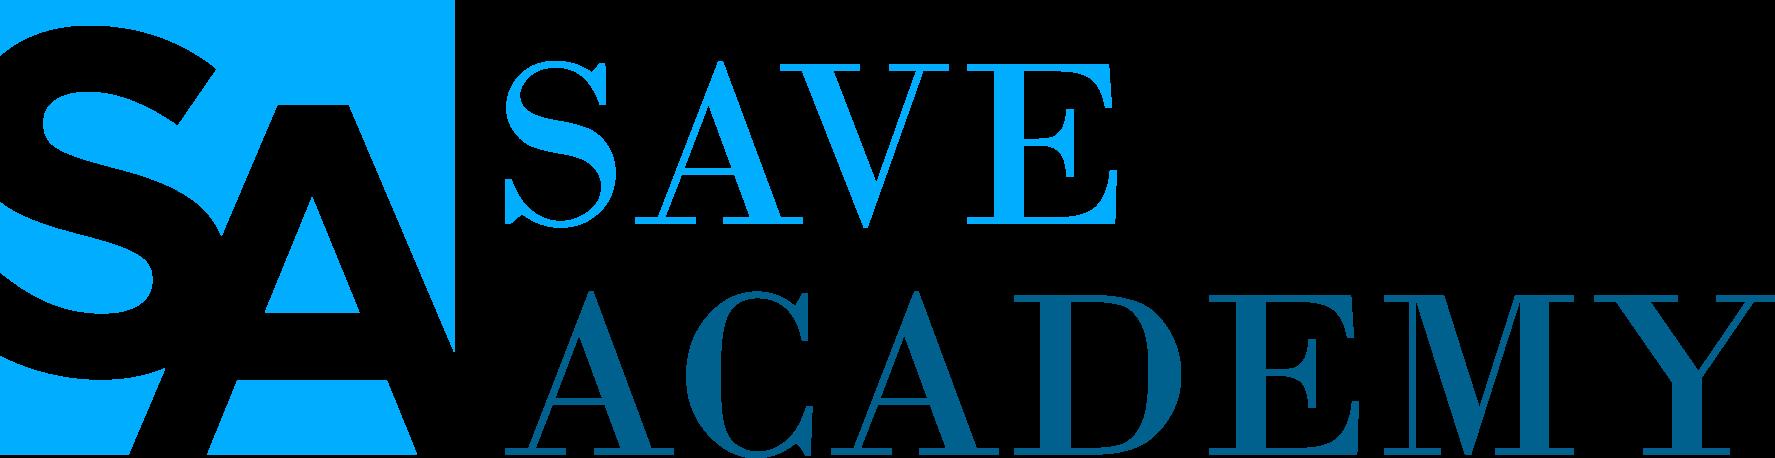 Save Academy